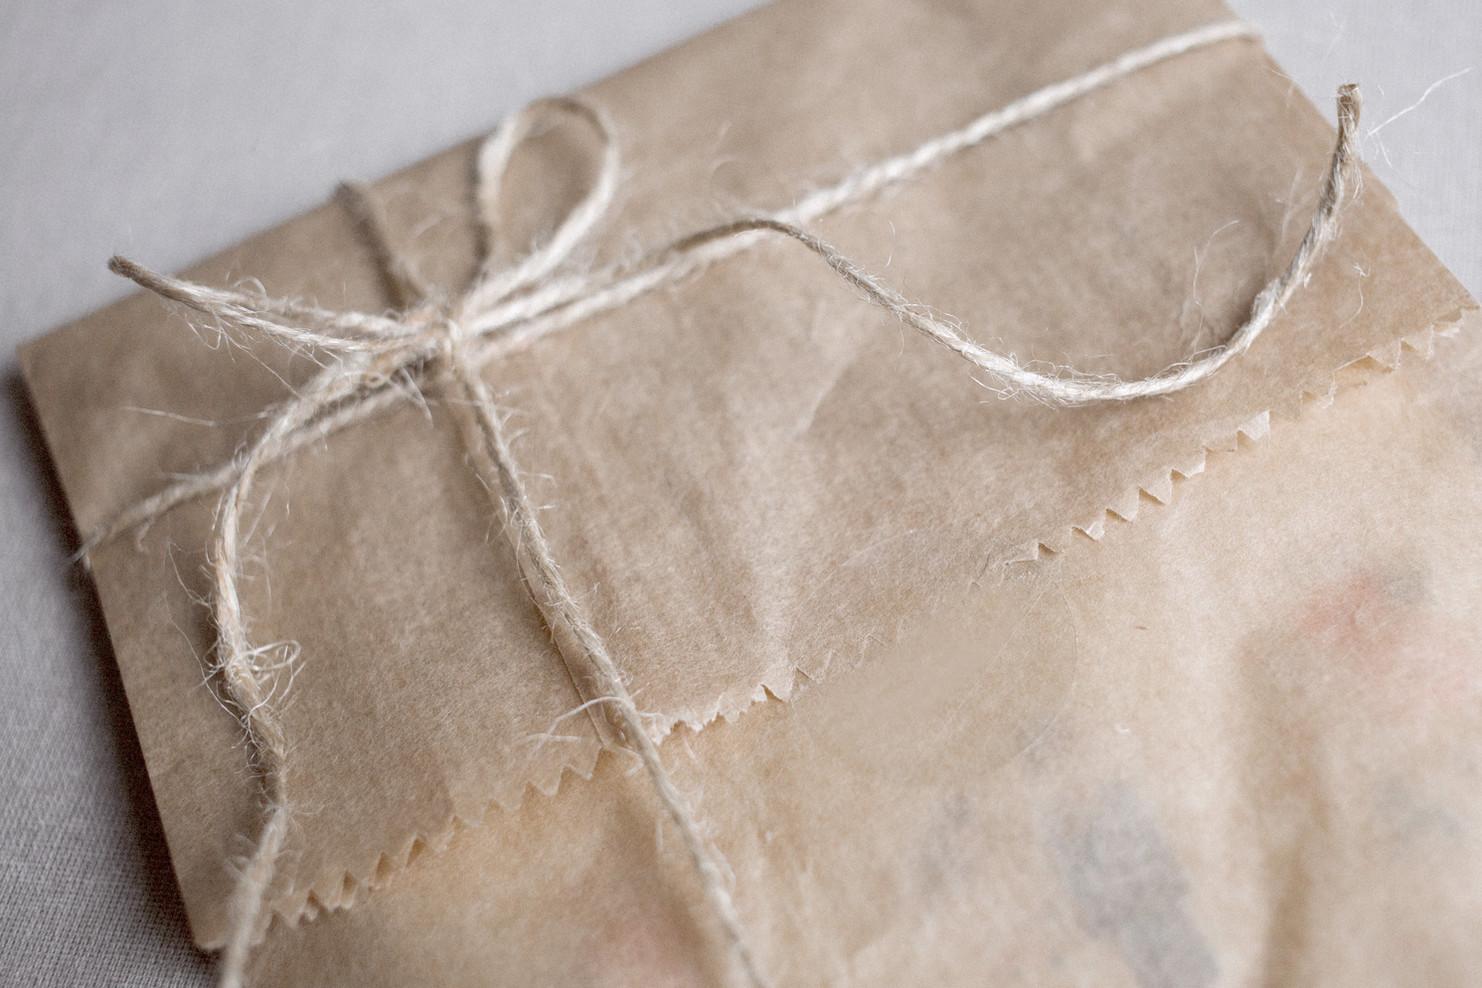 Unwrap your art kit.